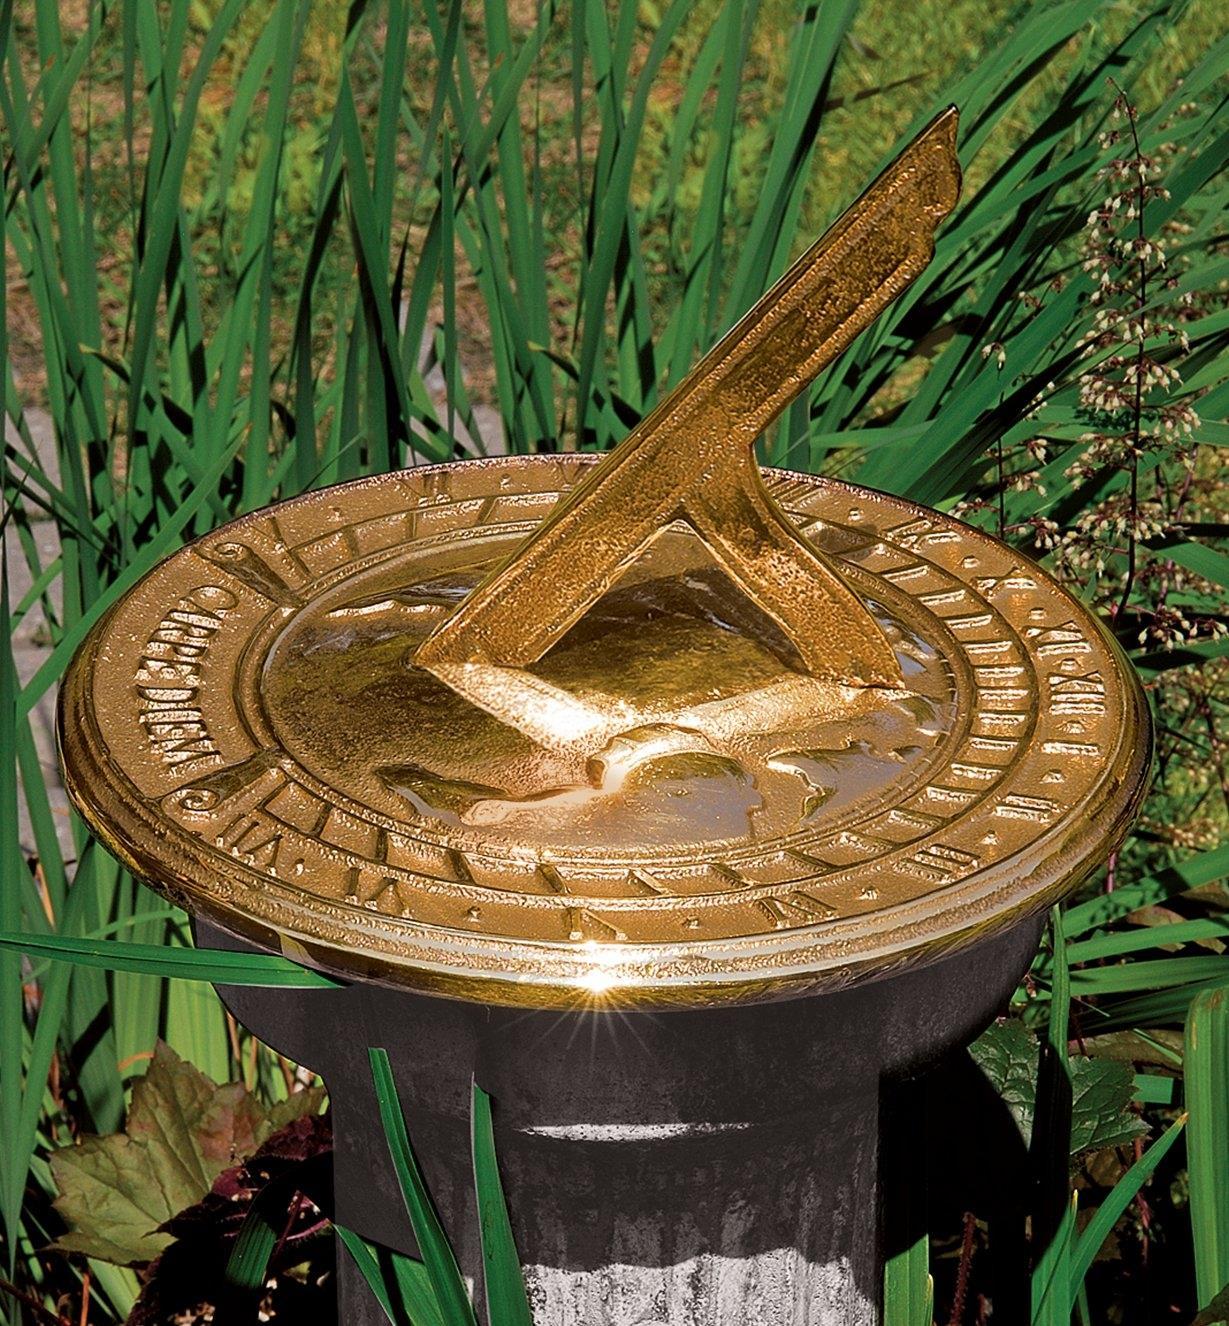 Bronze Sundial on a pedestal in the garden